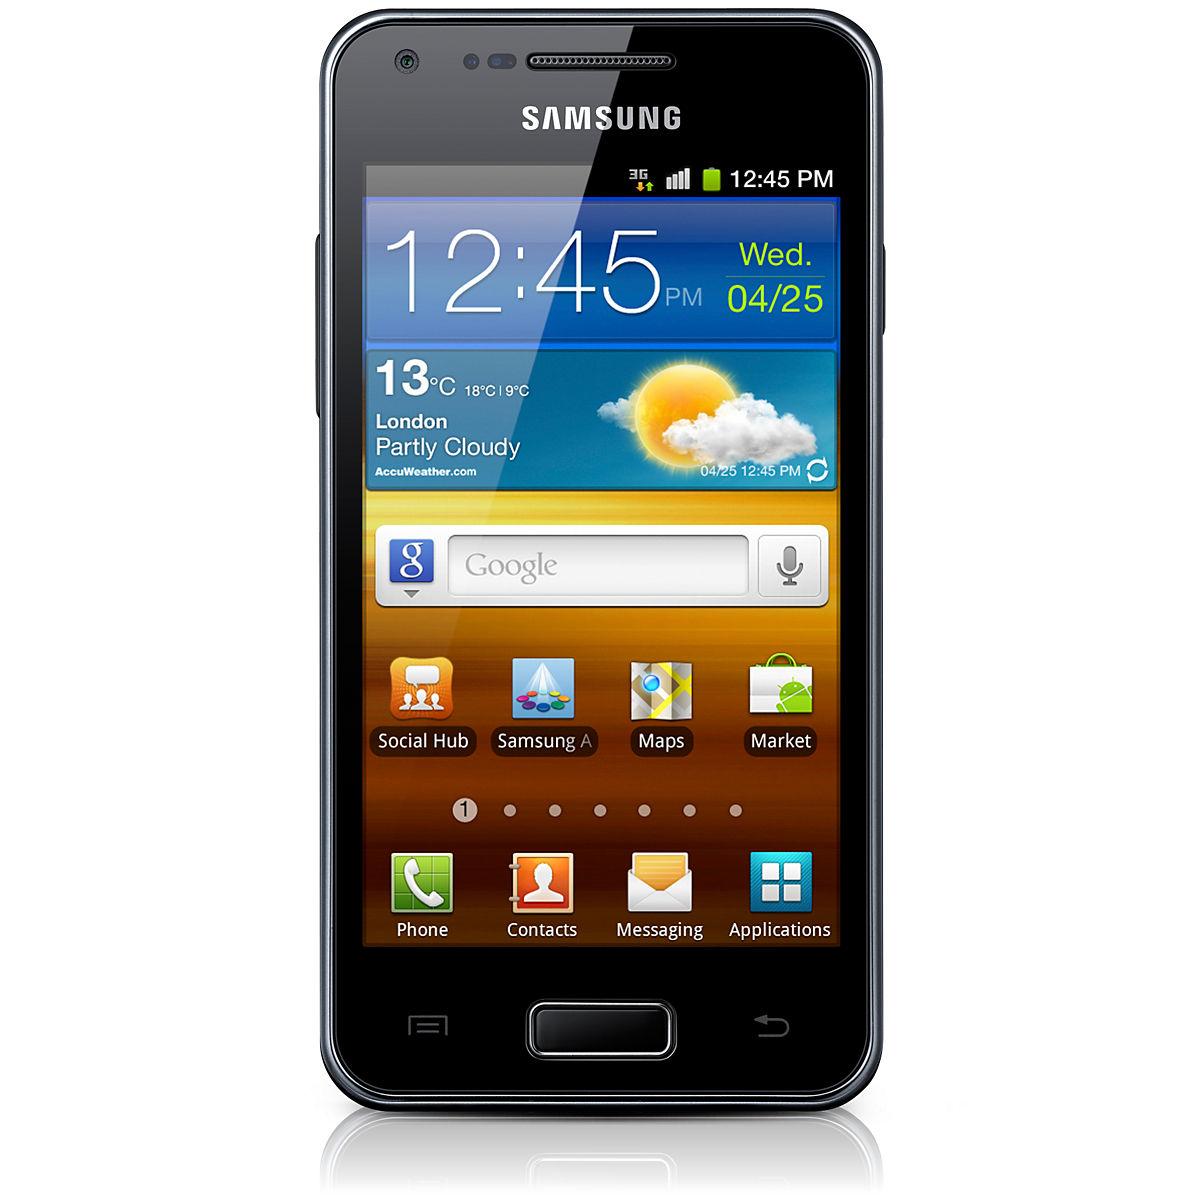 HP Samsung Terbaru - ikhsanudin